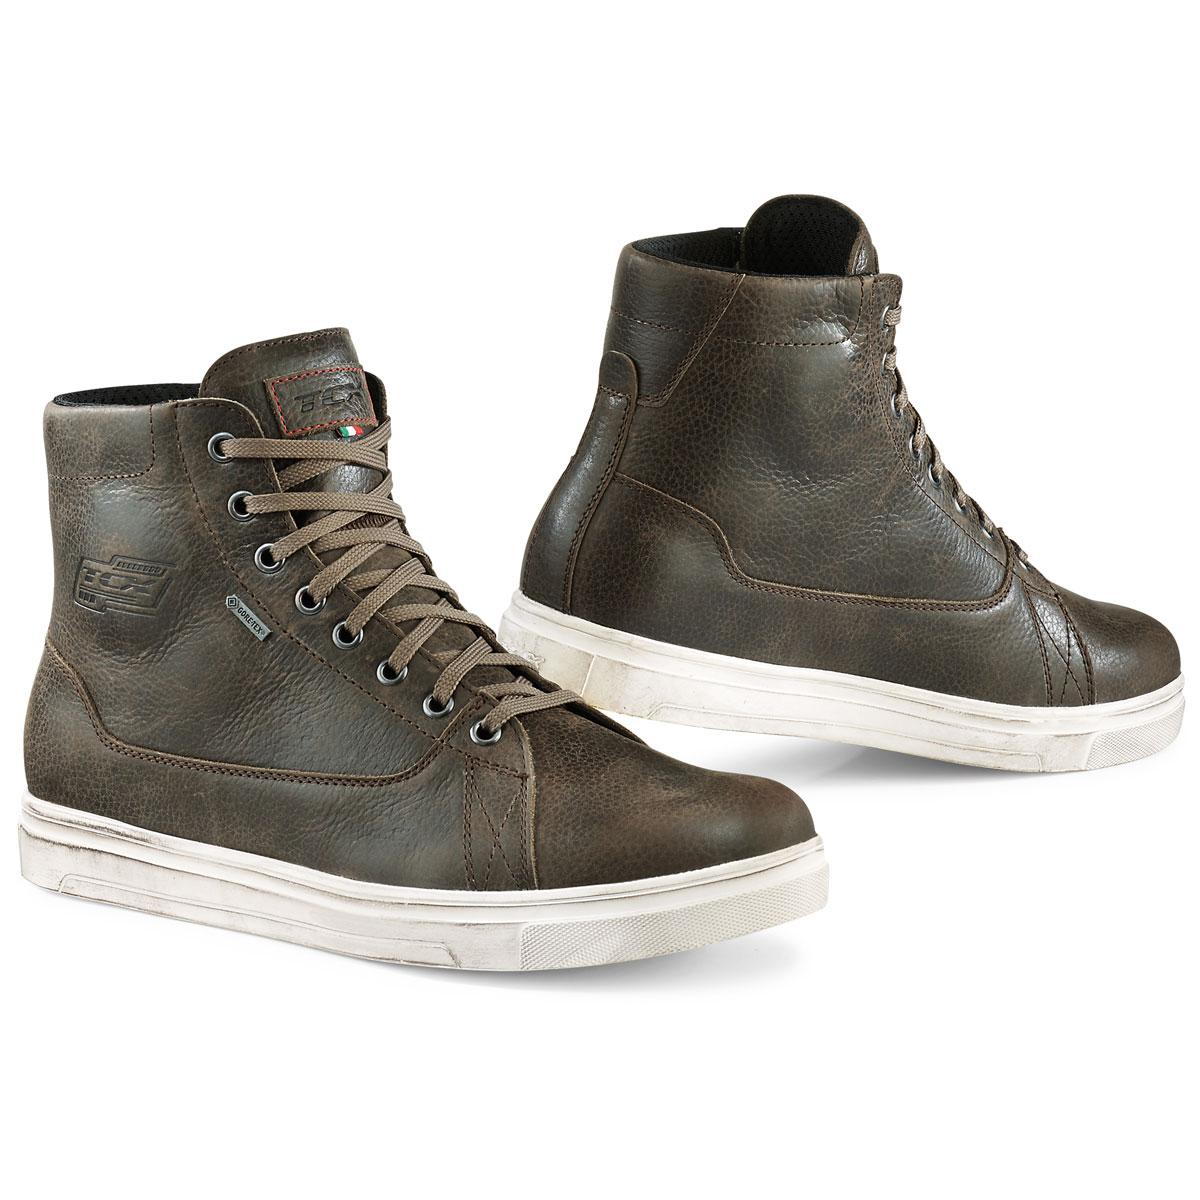 TCX Men's Mood Gore-Tex Vintage Brown Boots